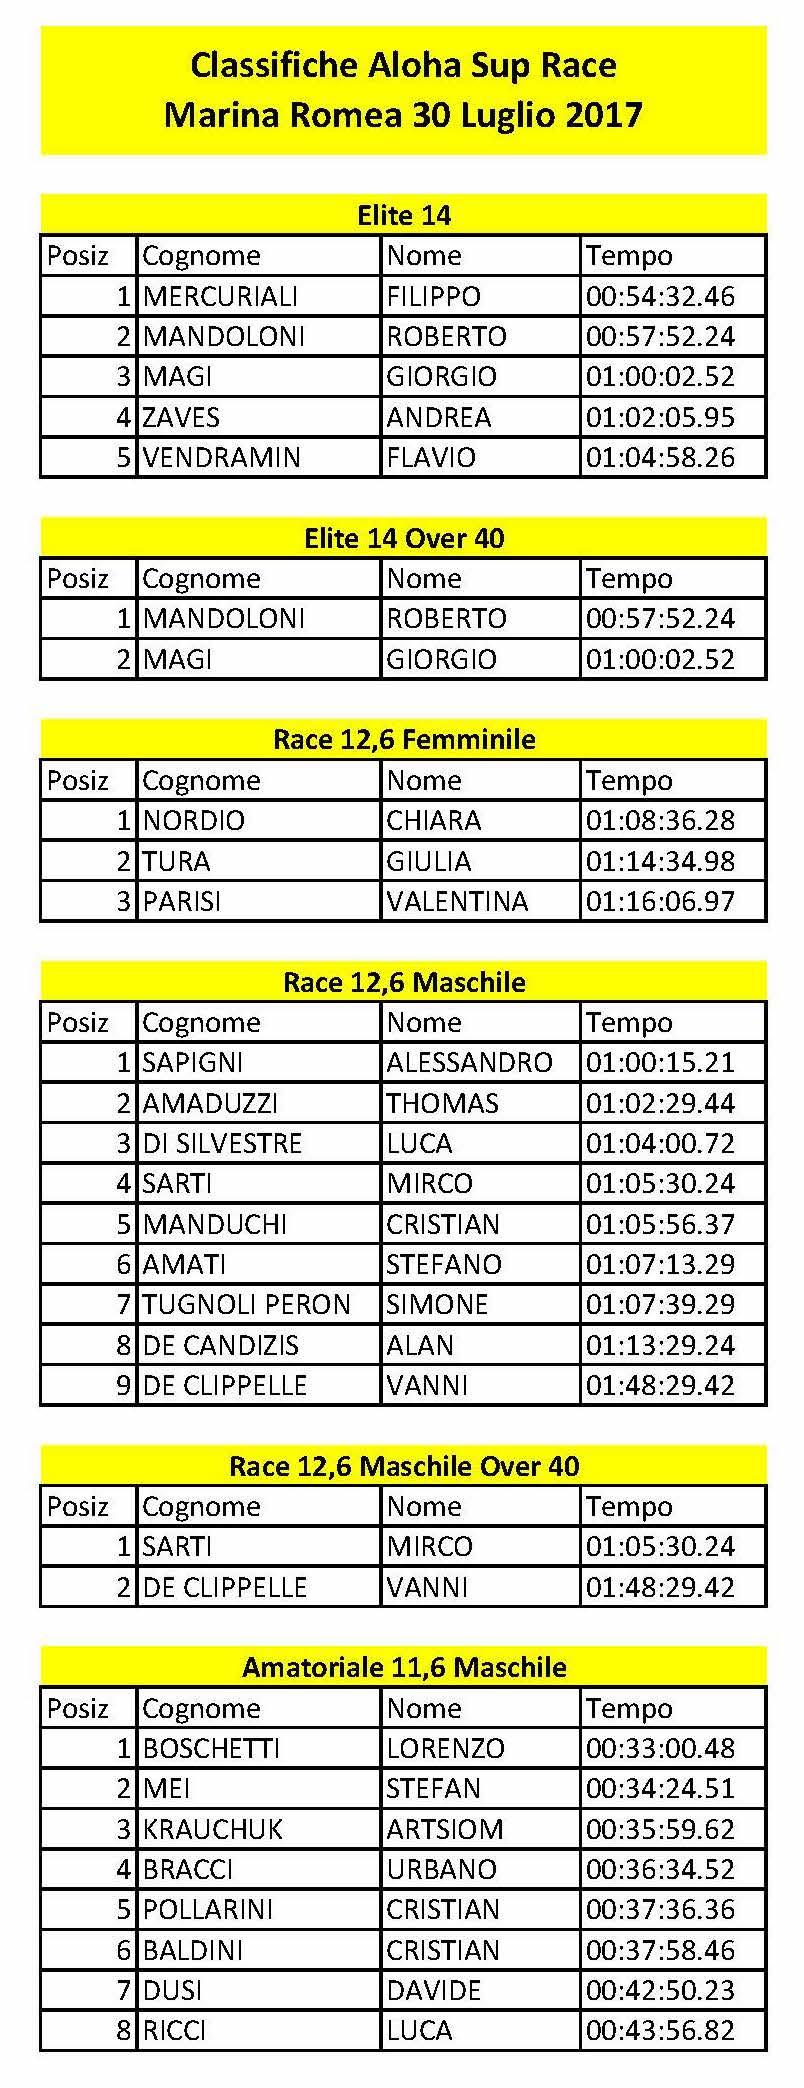 Classifiche-Aloha-Sup-Race-Marina-Romea-30-Luglio-2017_Page_1